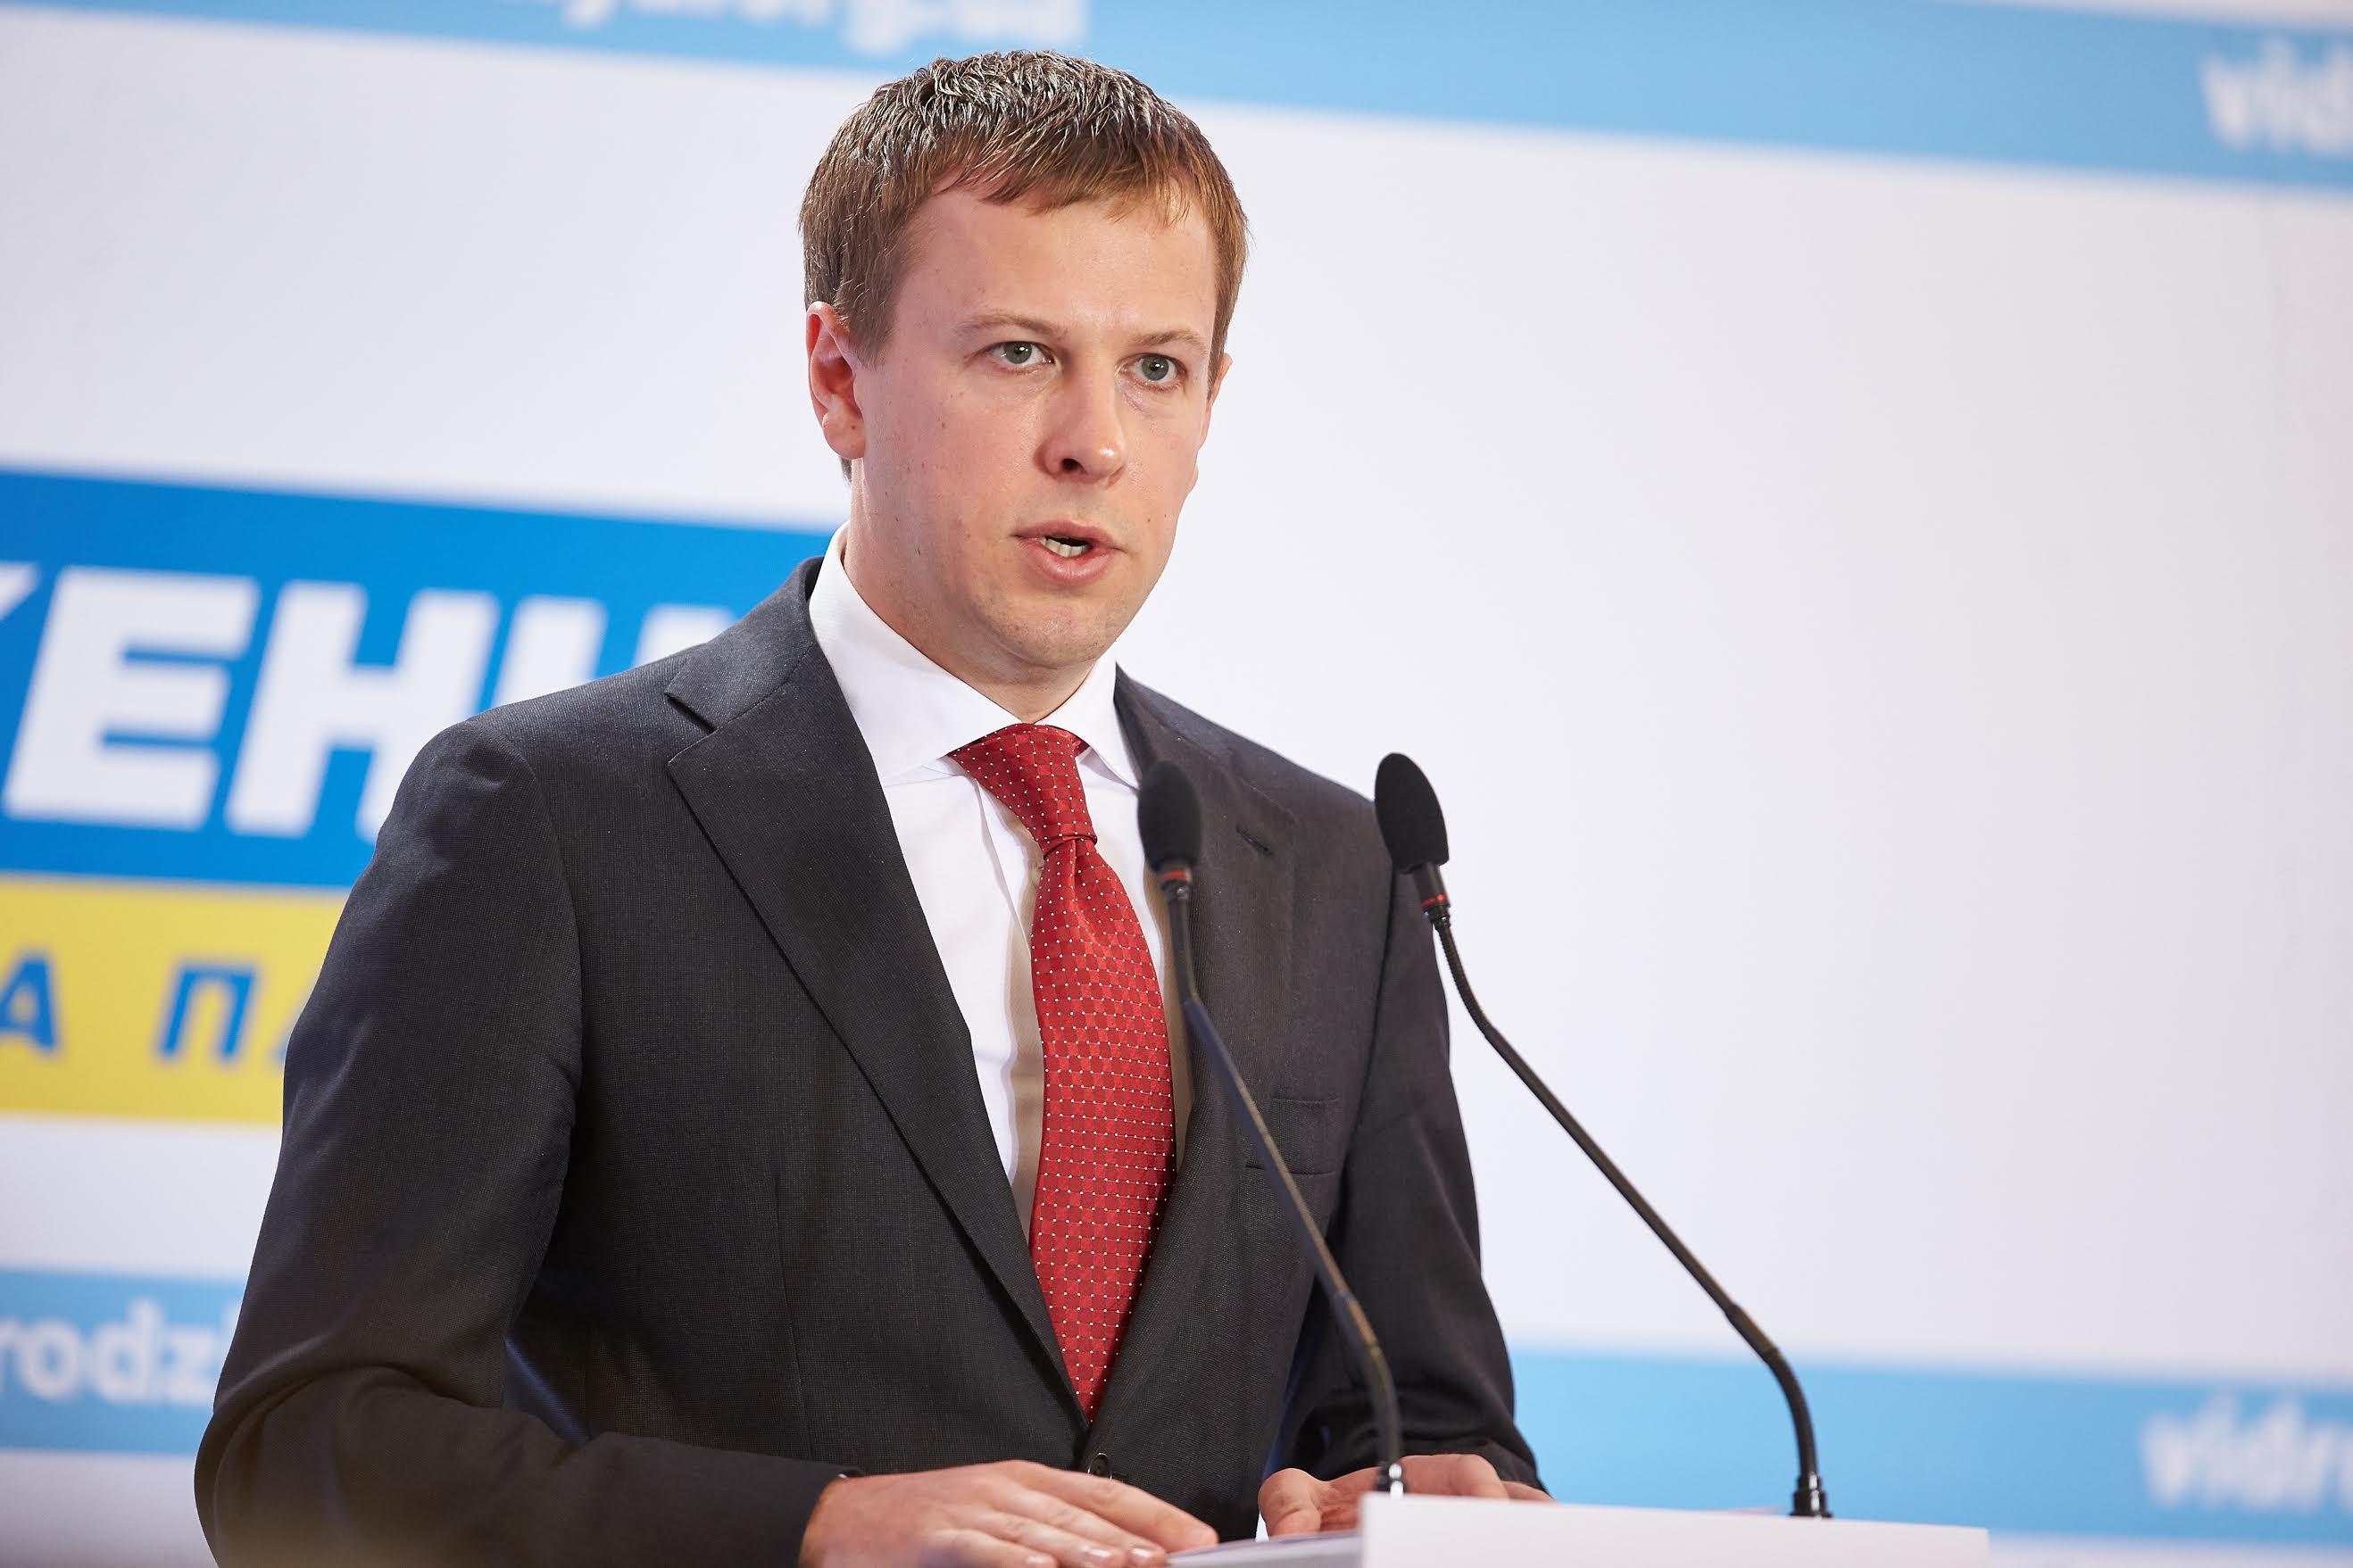 Декларация Хомутынника: 40 компаний, 40 млн грн и $10 млн насчетах